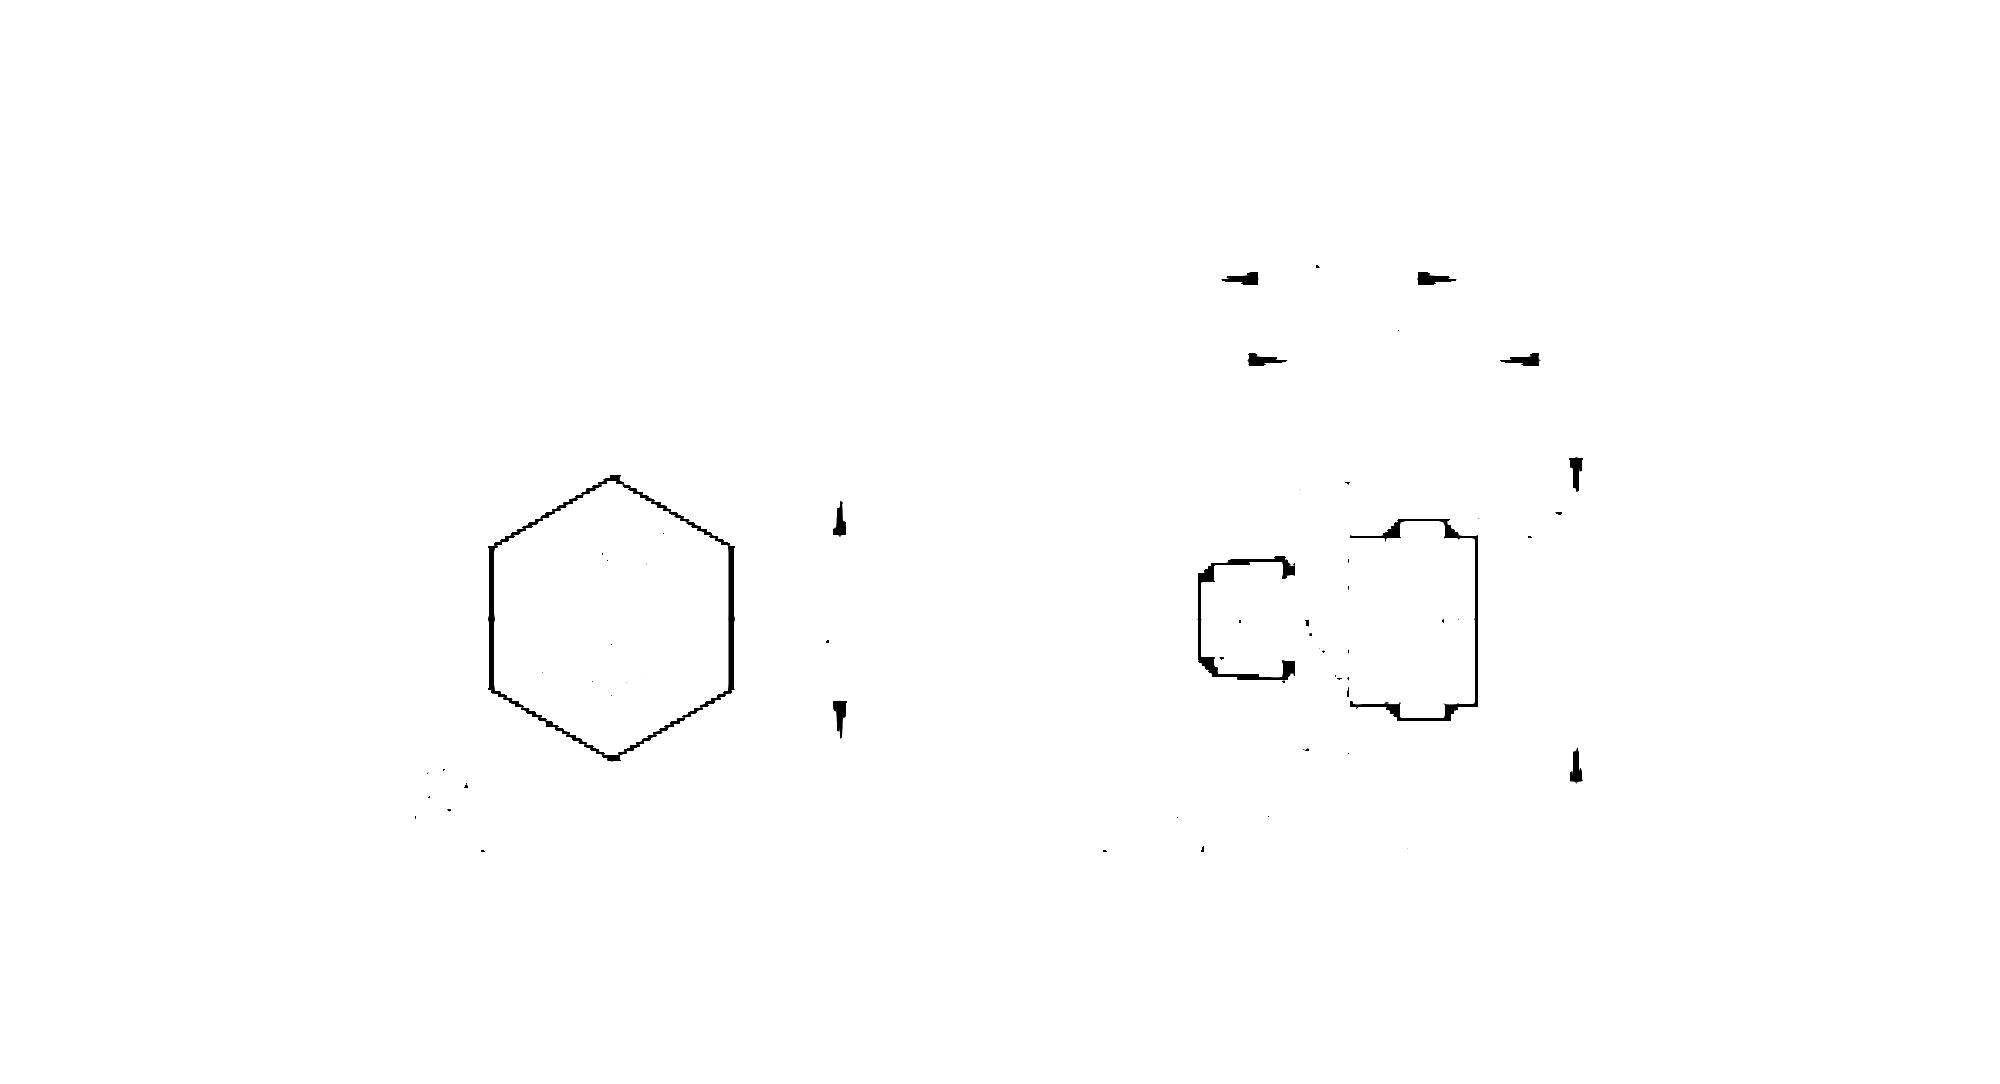 e18055 - male receptacle